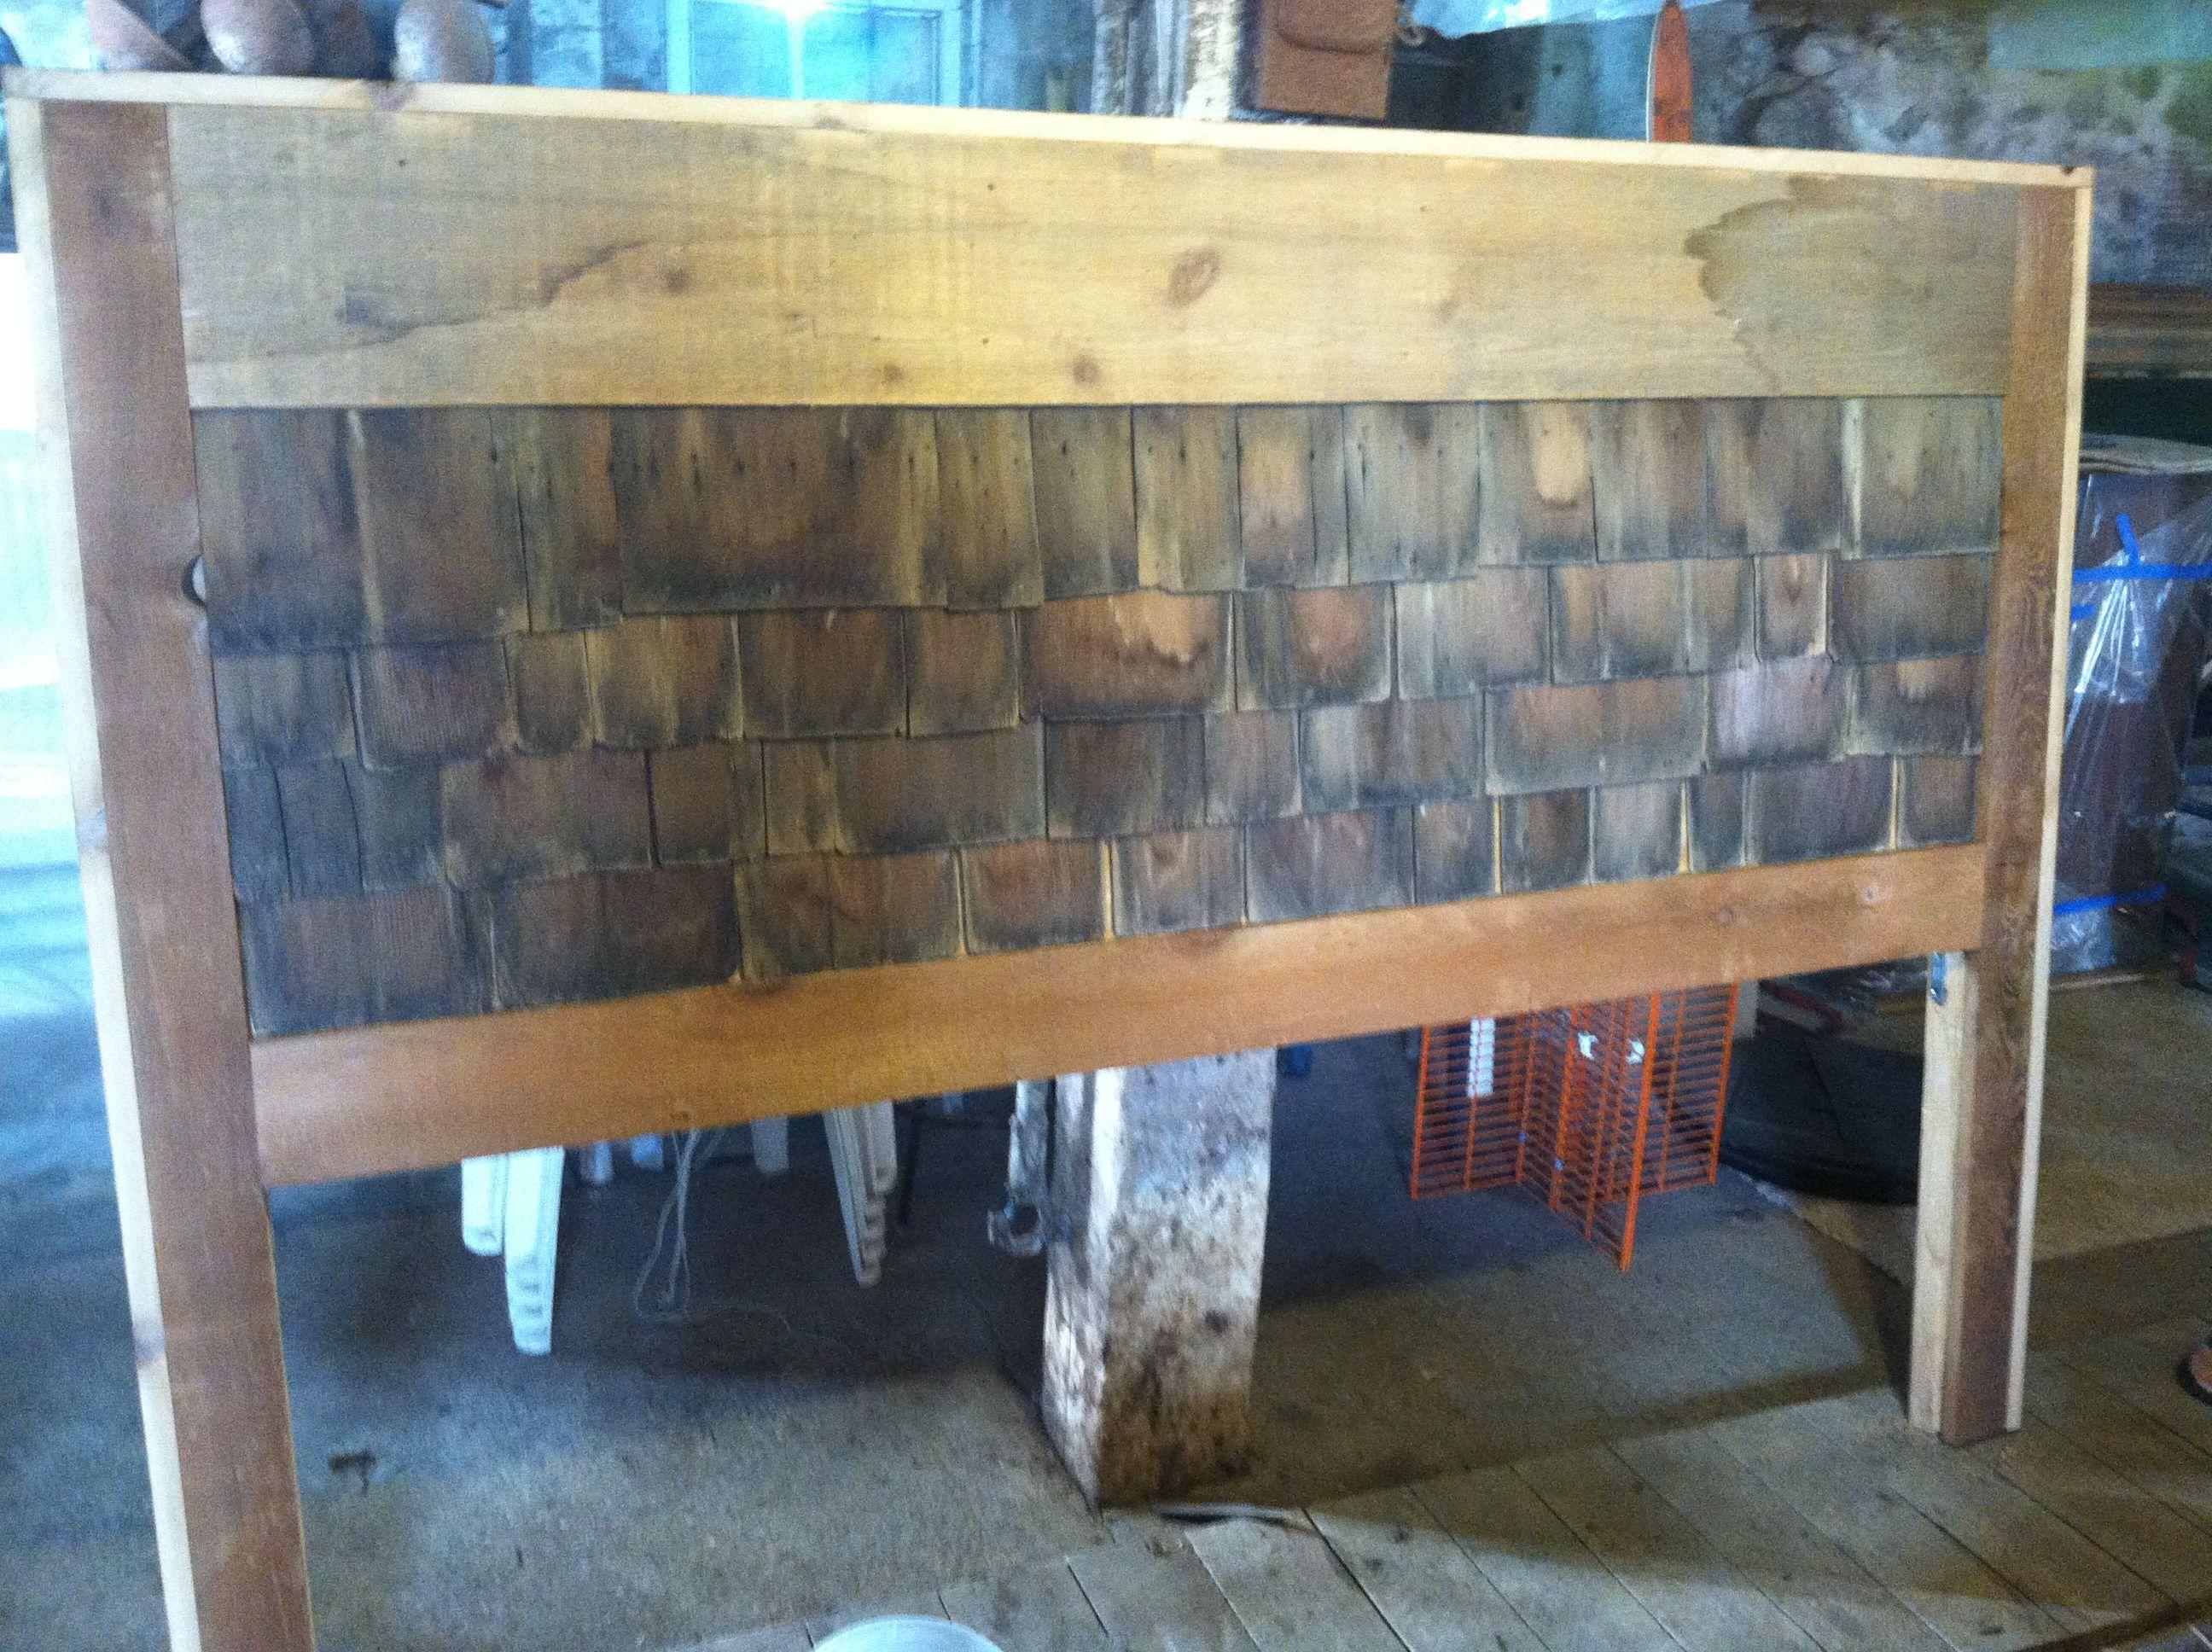 Headboard Rough Cut Cedar And Old Cedar Shake Shingles